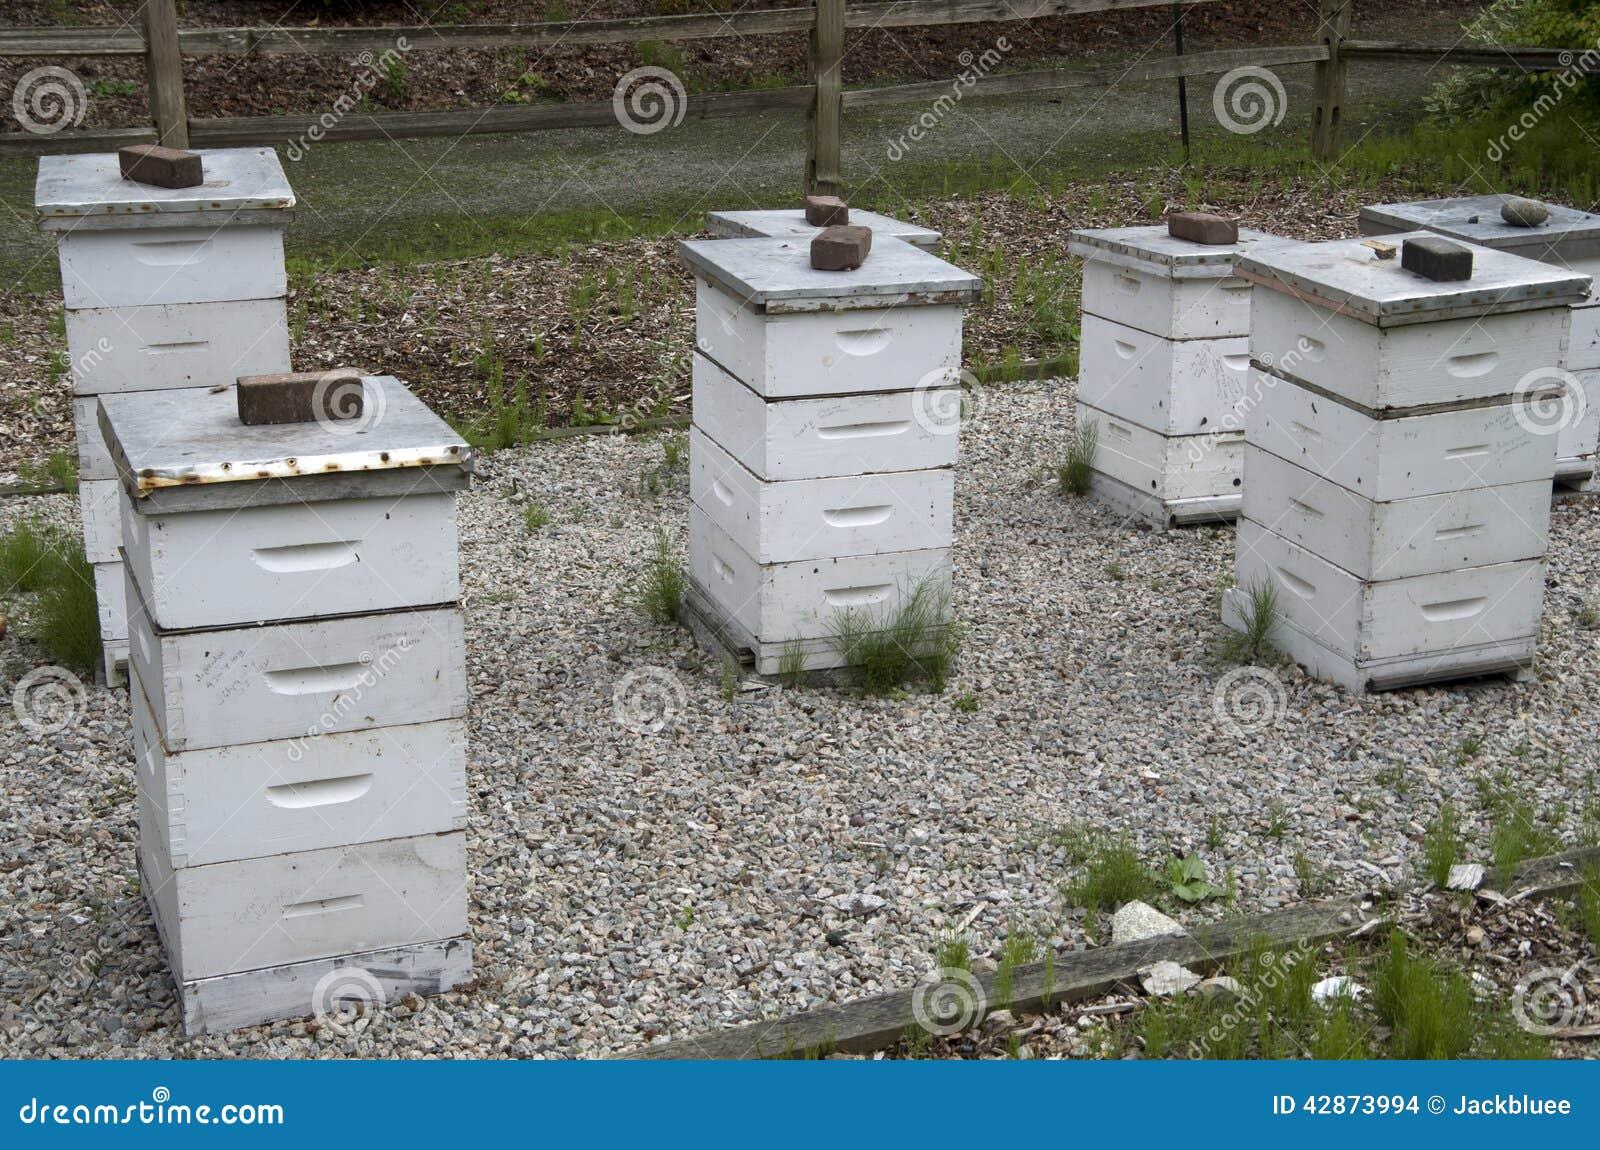 Bee Hive Box Farm Stock Photo - Image: 42873994